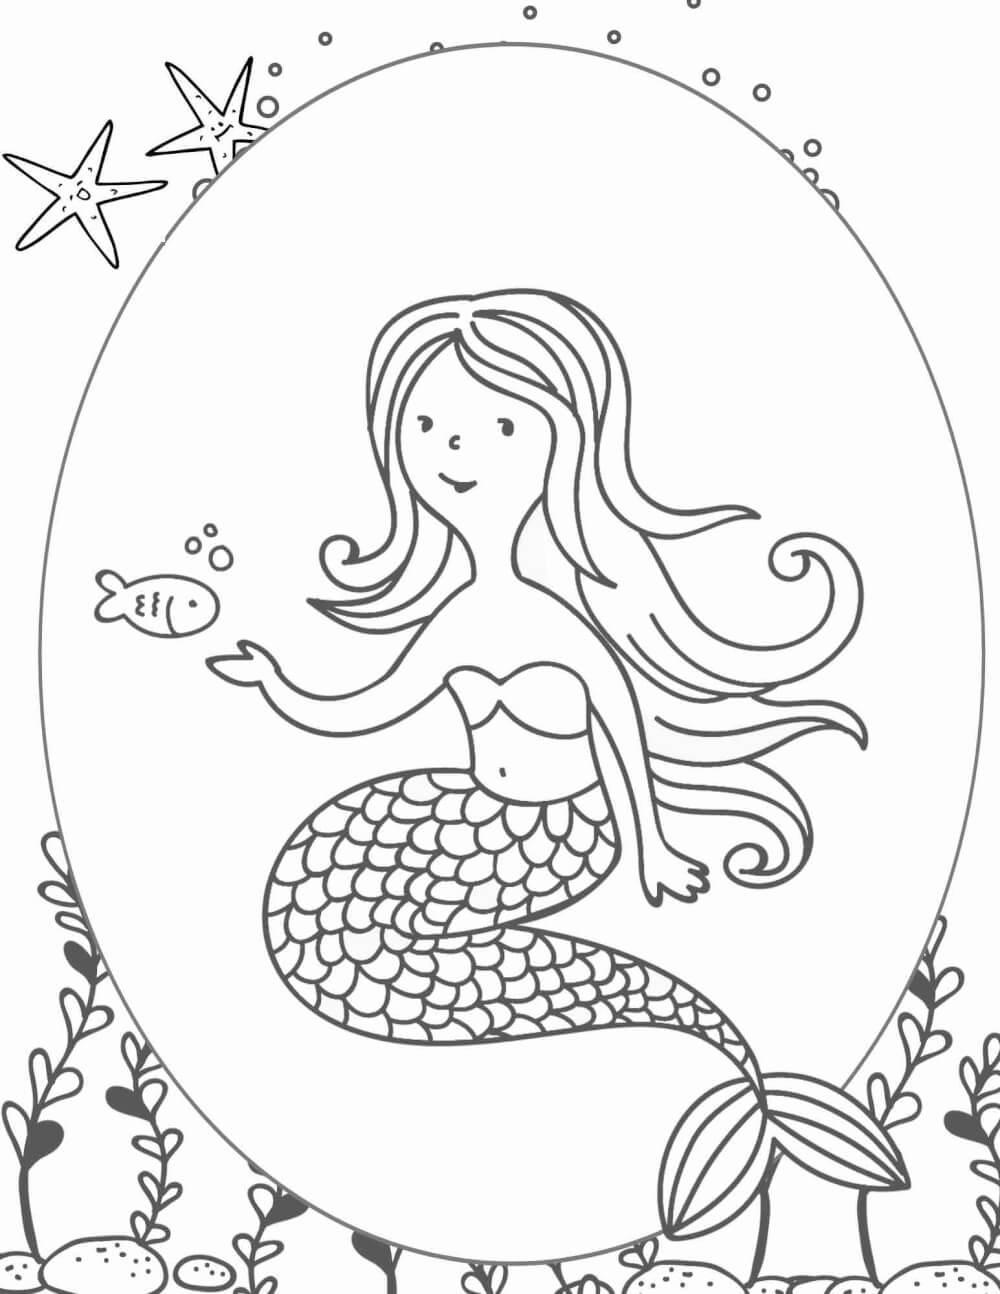 Mermaid Activity Pack Free Kids Printable by top Hawaii blog Hawaii Travel with Kids